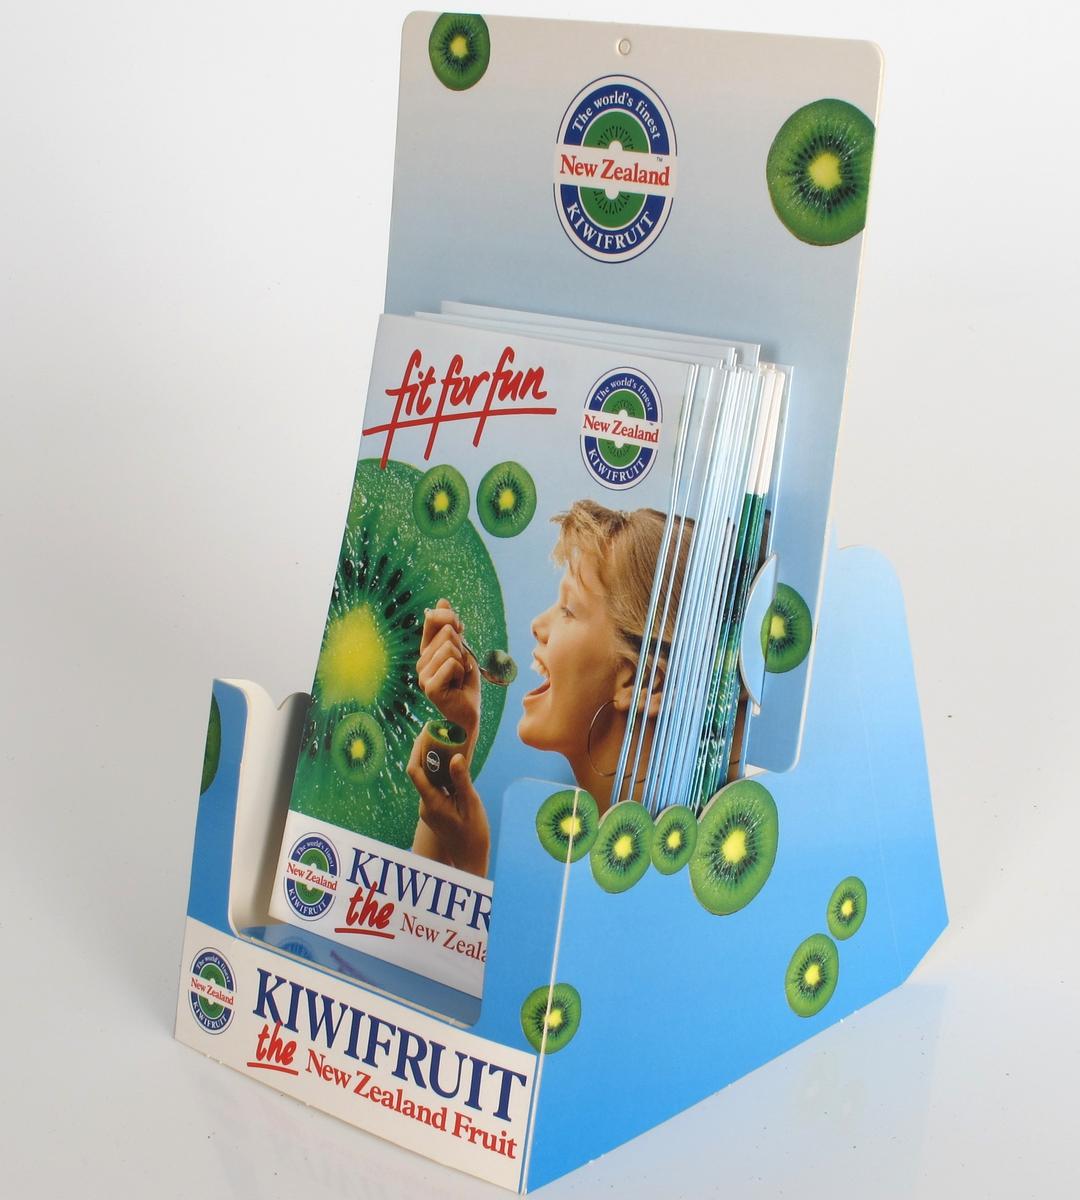 Aktive ungdommer, kiwifrukter, m.m.